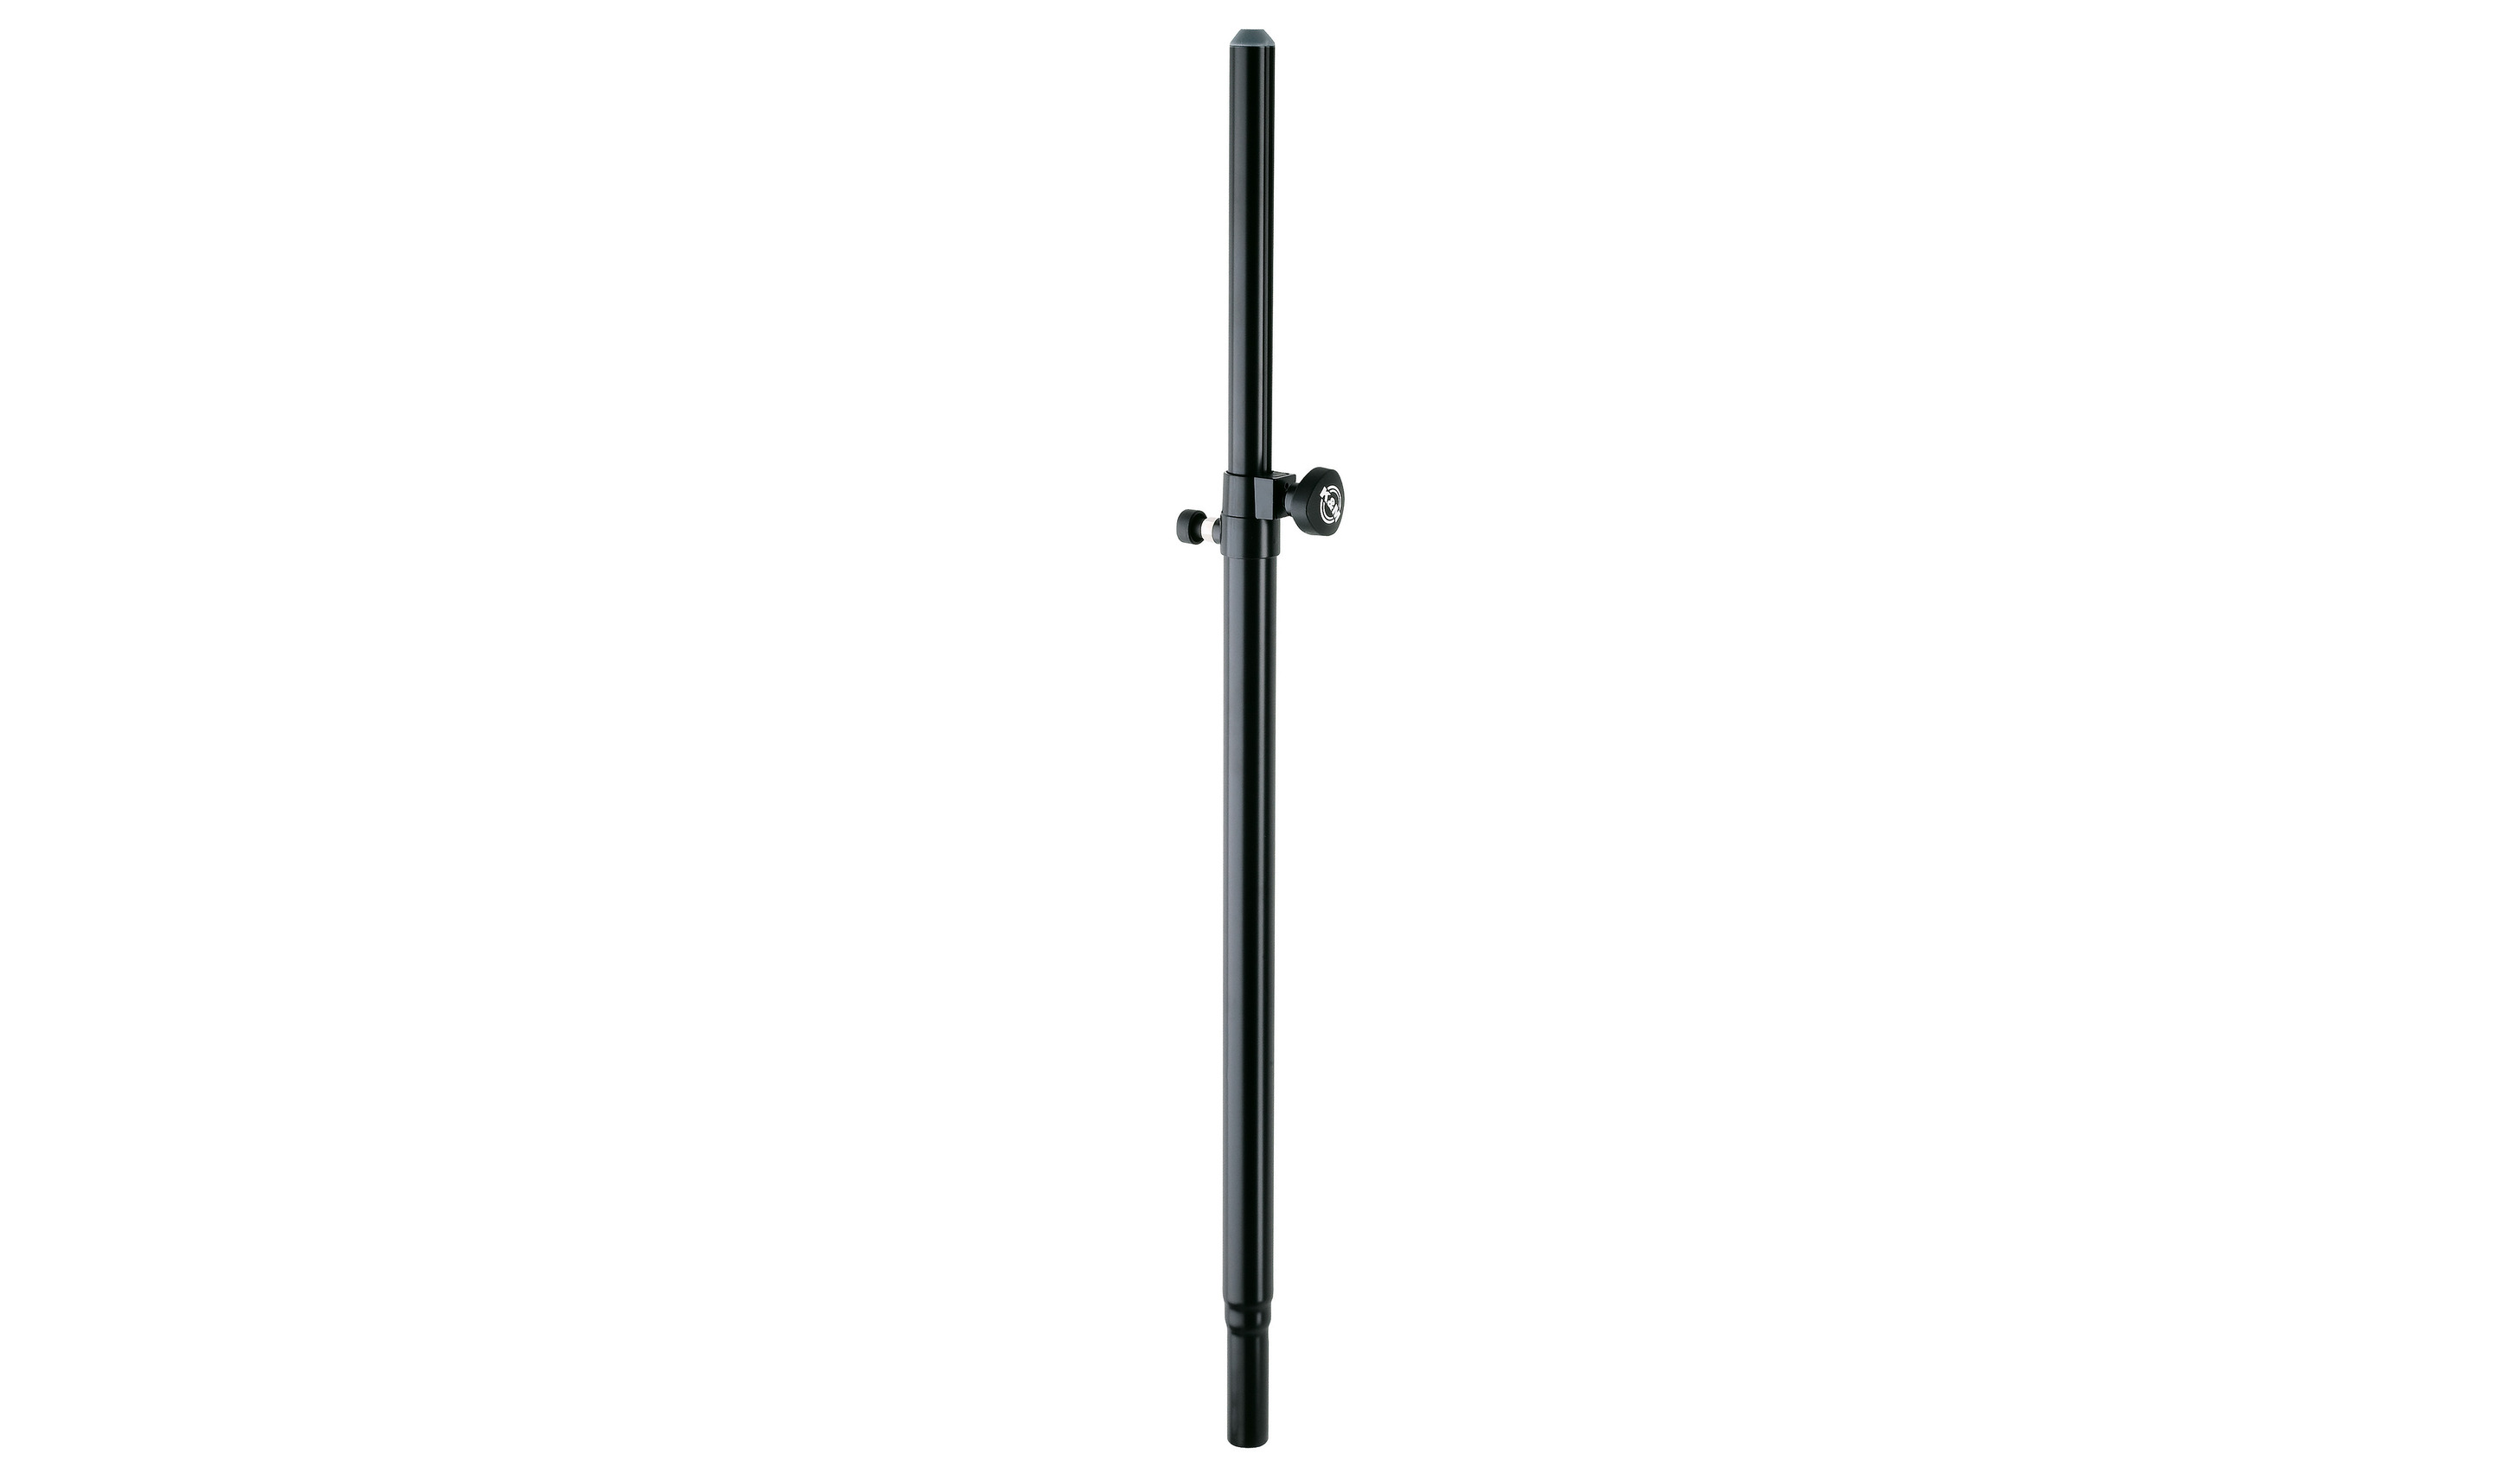 K&M 21336-000-55 Distance rod